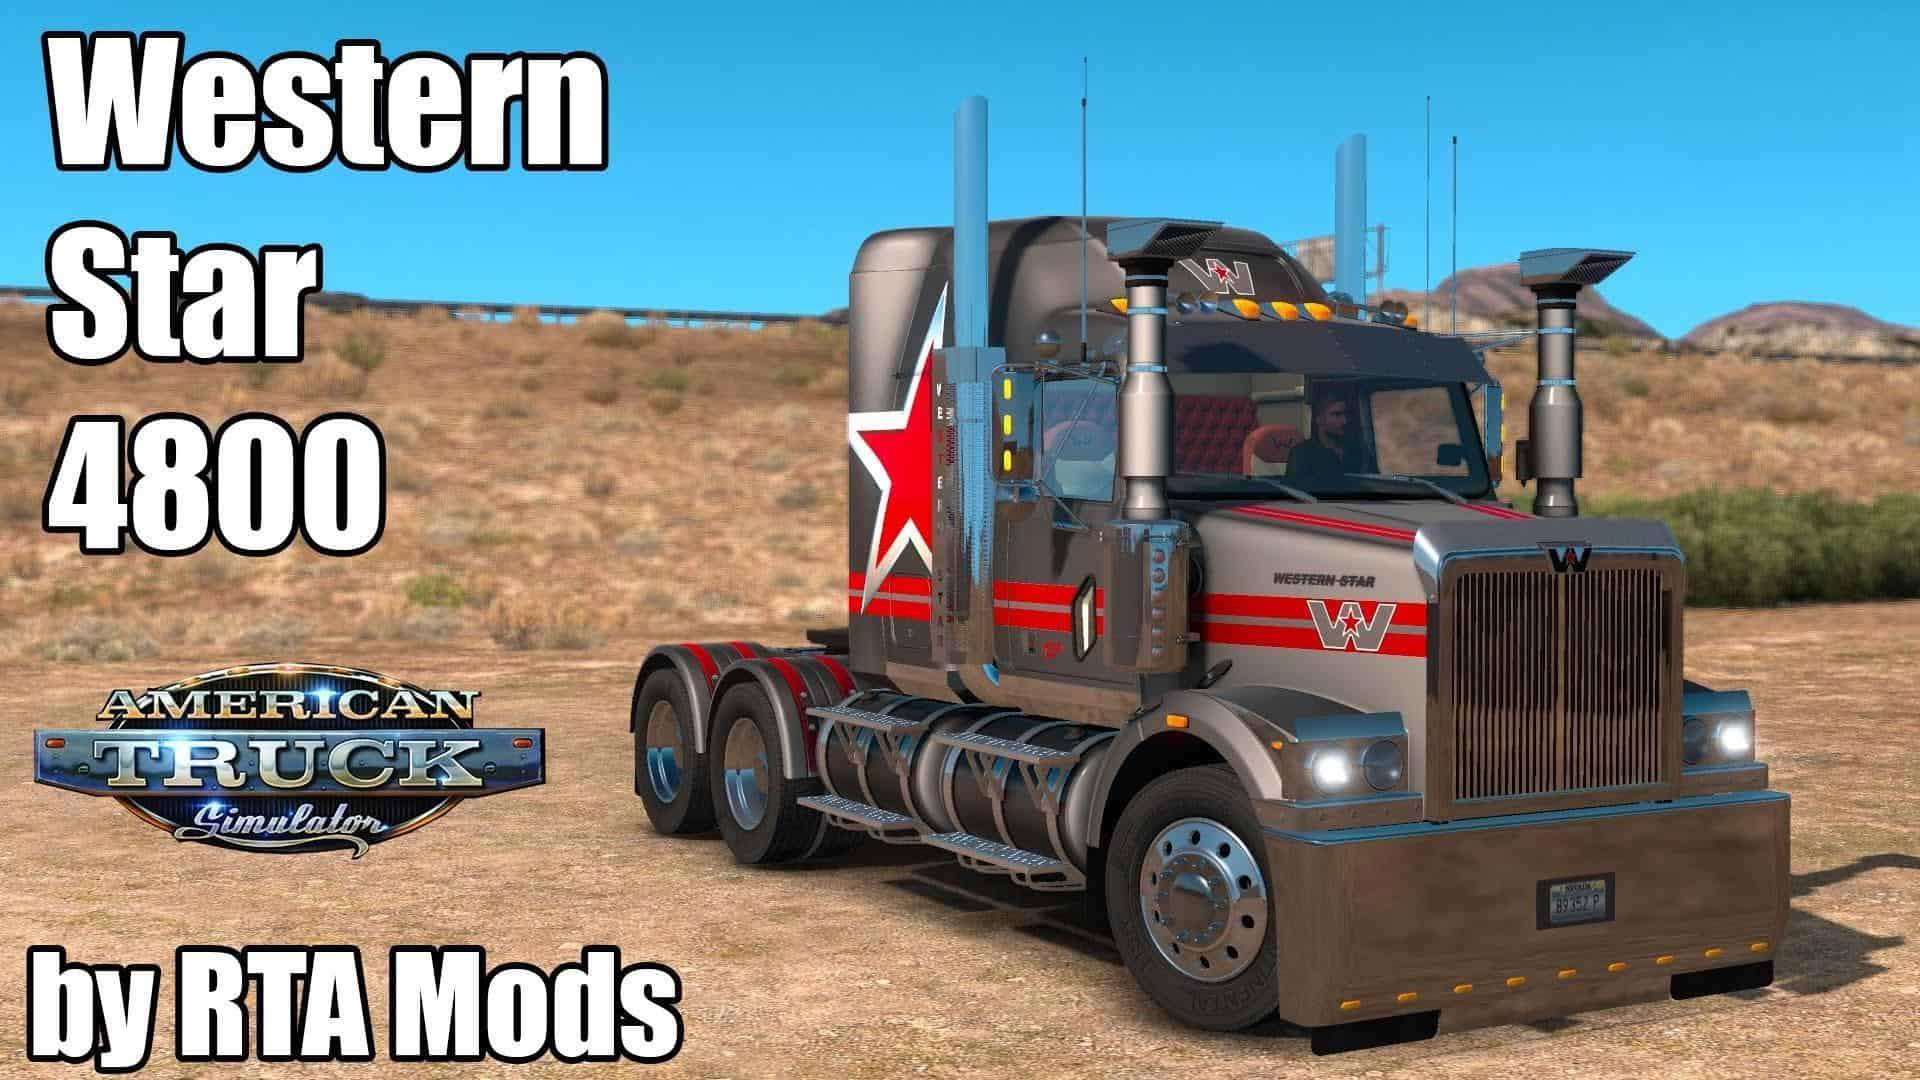 Nn 3d Wallpaper Western Star 4800 Truck By Rta Mods American Truck